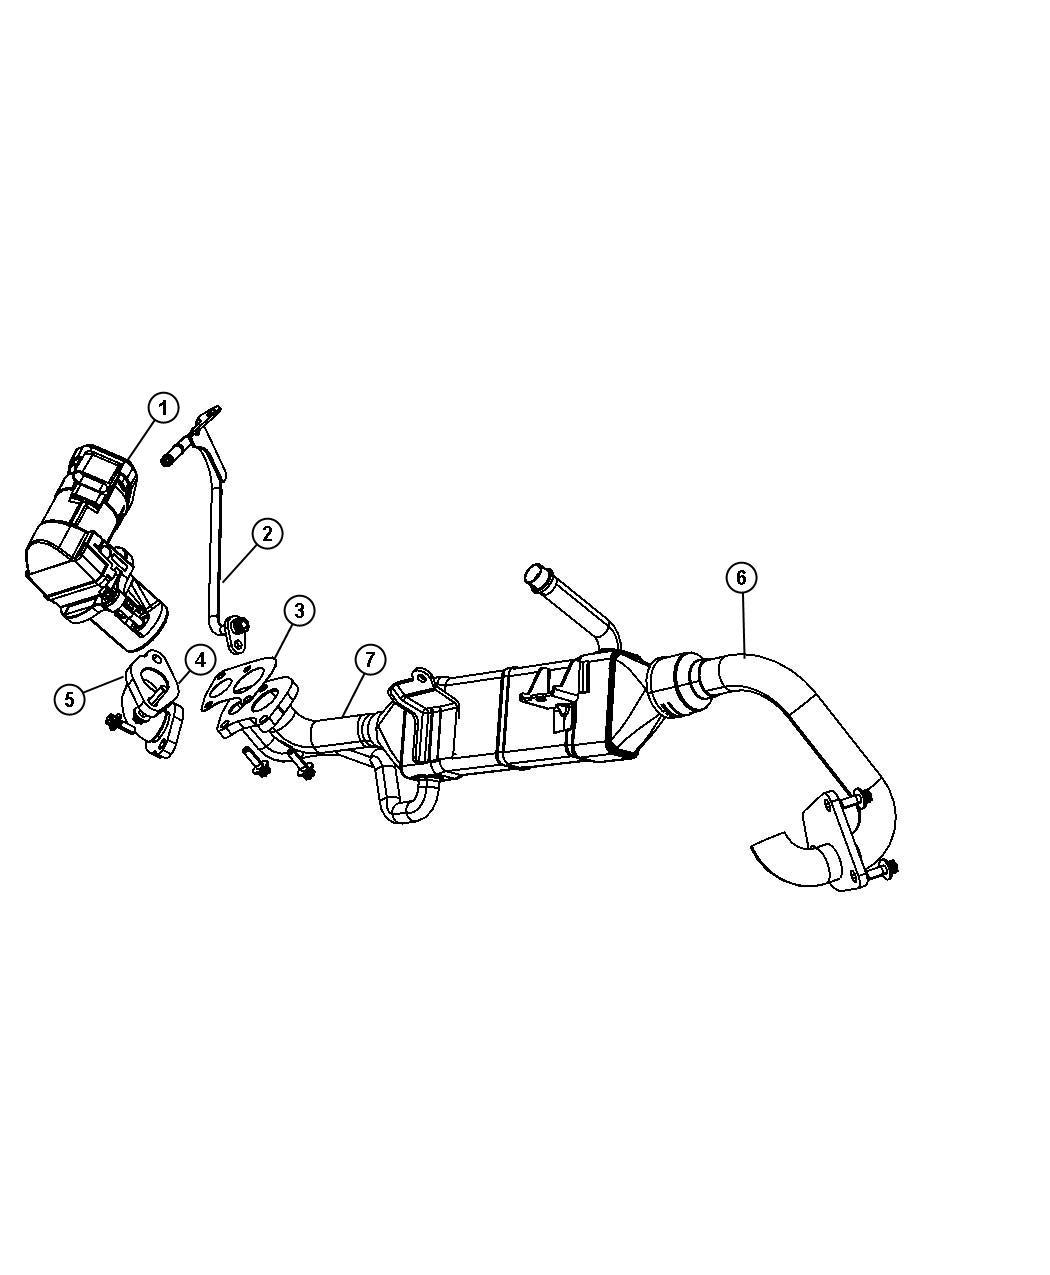 Jeep Grand Cherokee Cooler. Charge air, egr. Diesel